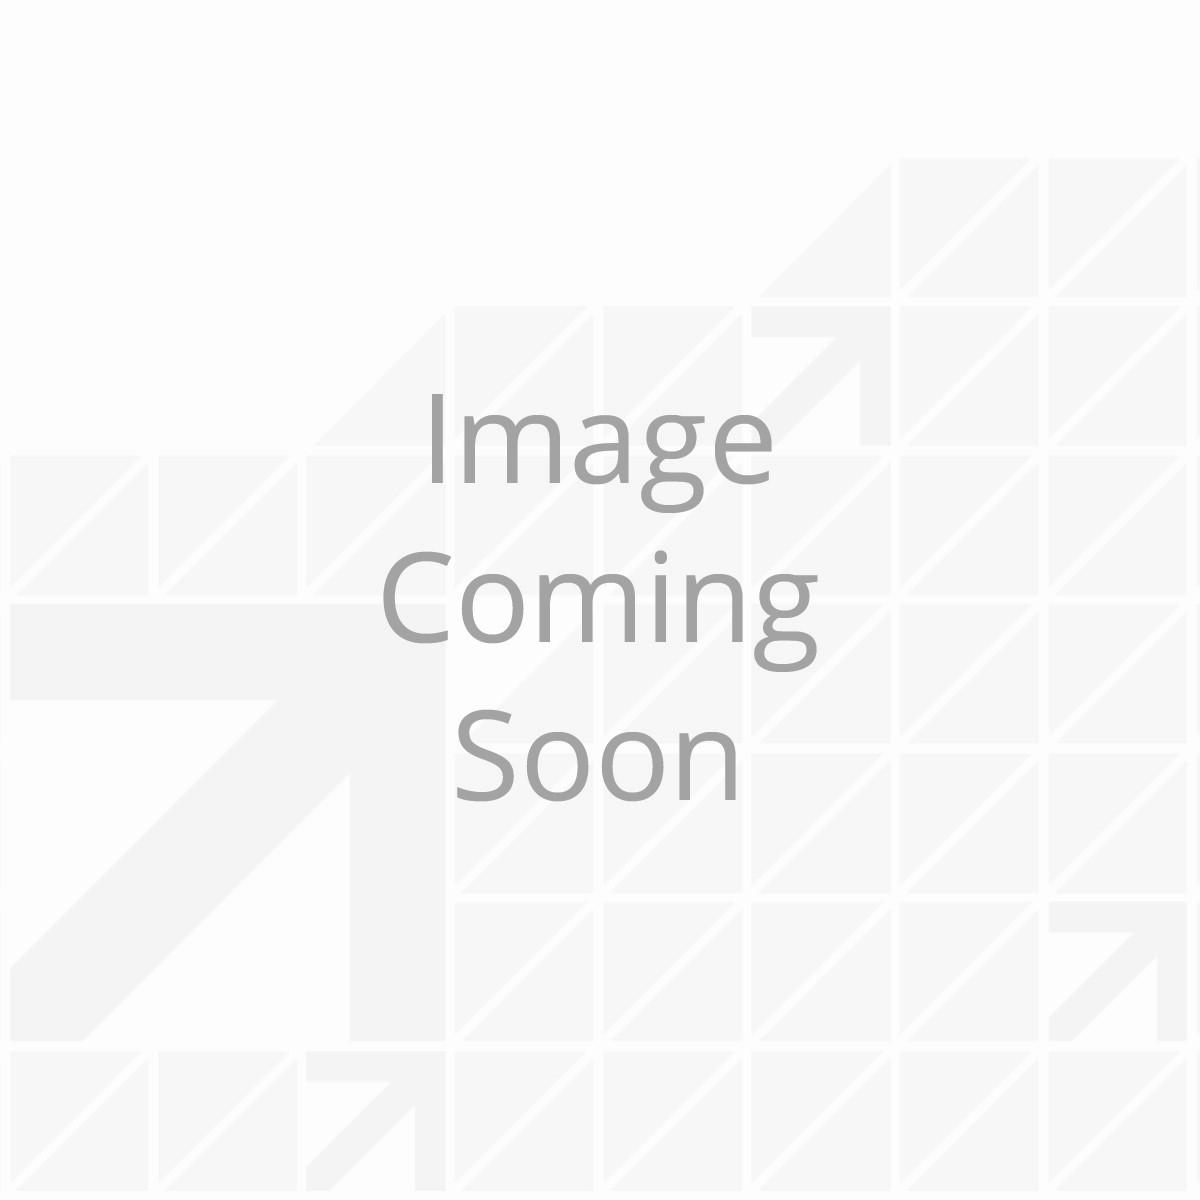 Equa-Flex® Rubberized Equalizer - Tandem Axle Kit, Heavy-Duty 6,000 to 8,000 lbs.